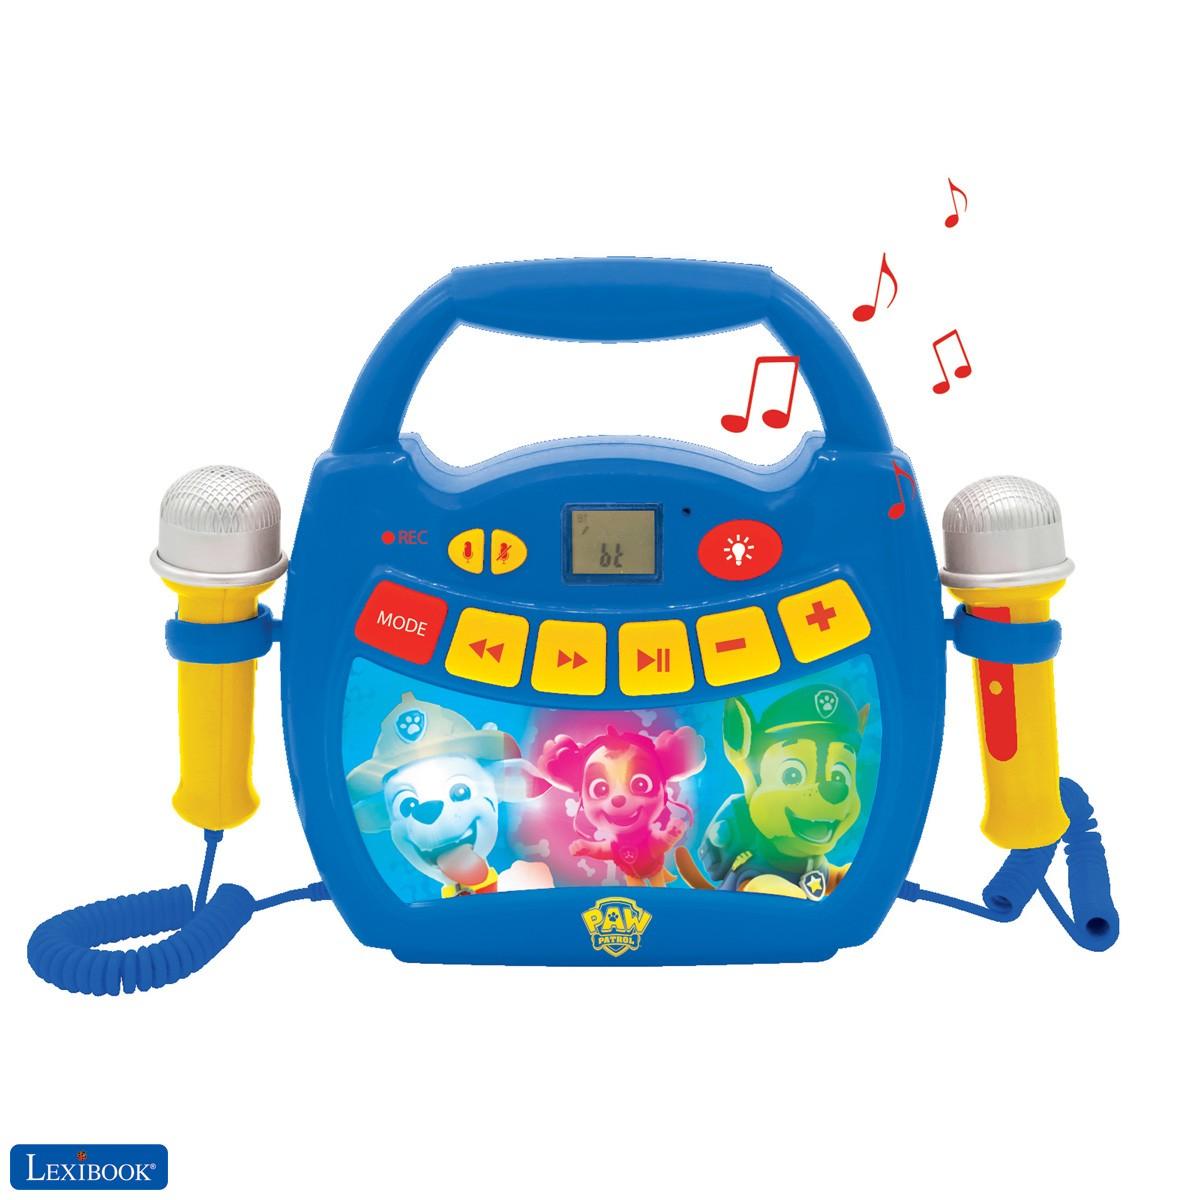 Paw Patrol - Portable Karaoke digital player for kids